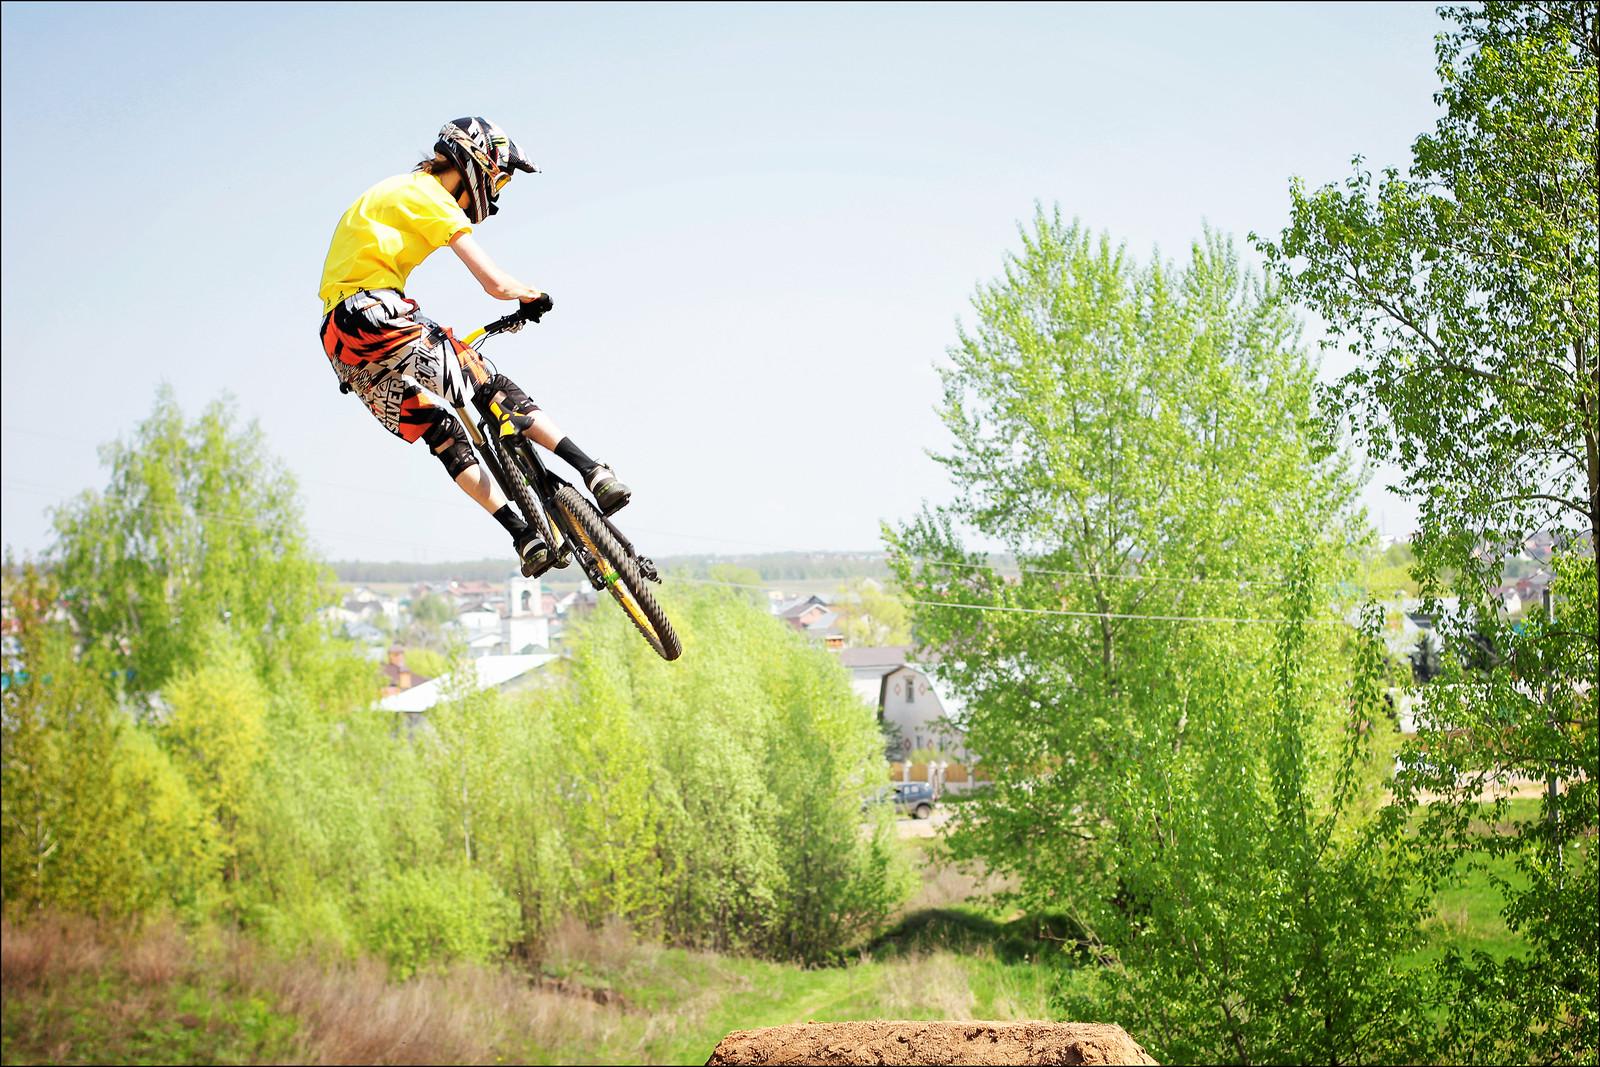 IMG 2839 - YakuT - Mountain Biking Pictures - Vital MTB